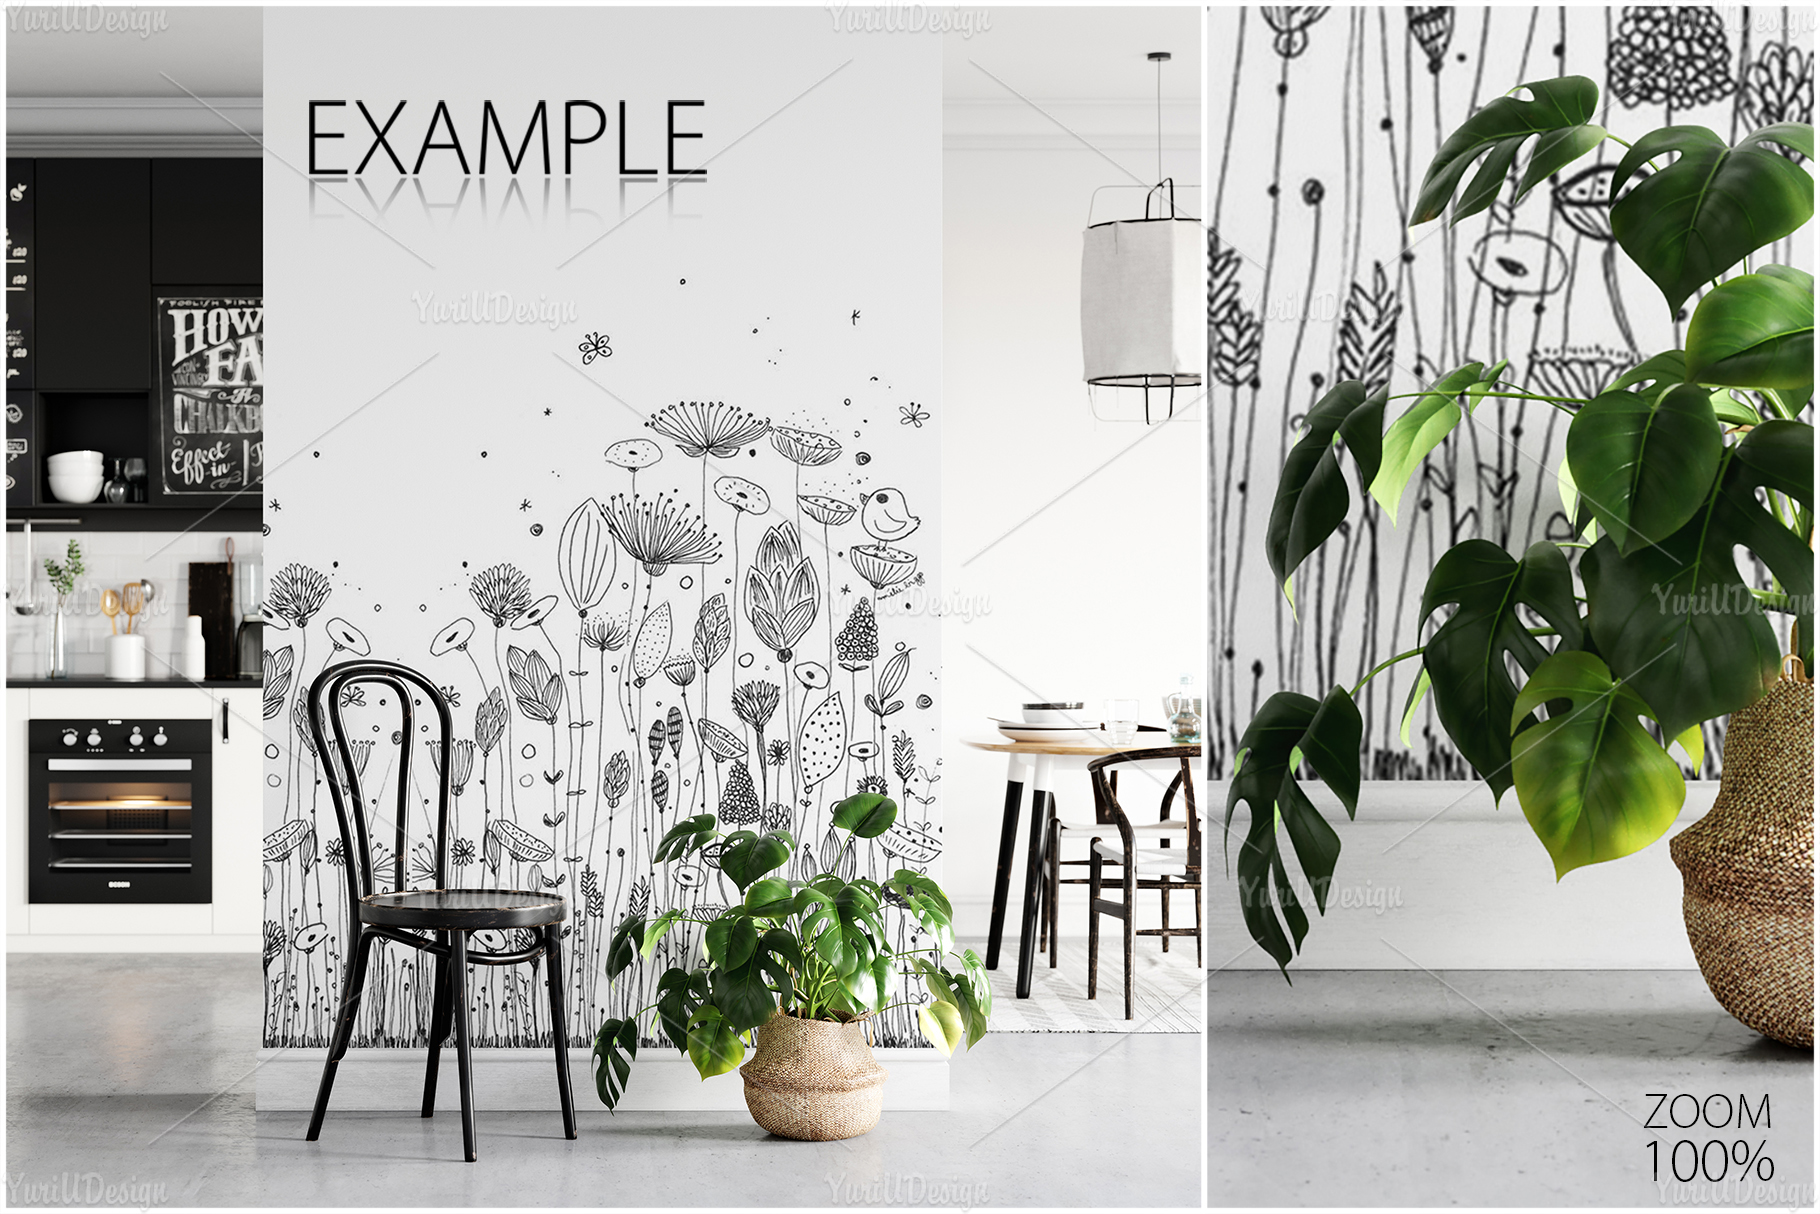 Scandinavian Interior Frames & Walls Mockup Bundle - 3 example image 14